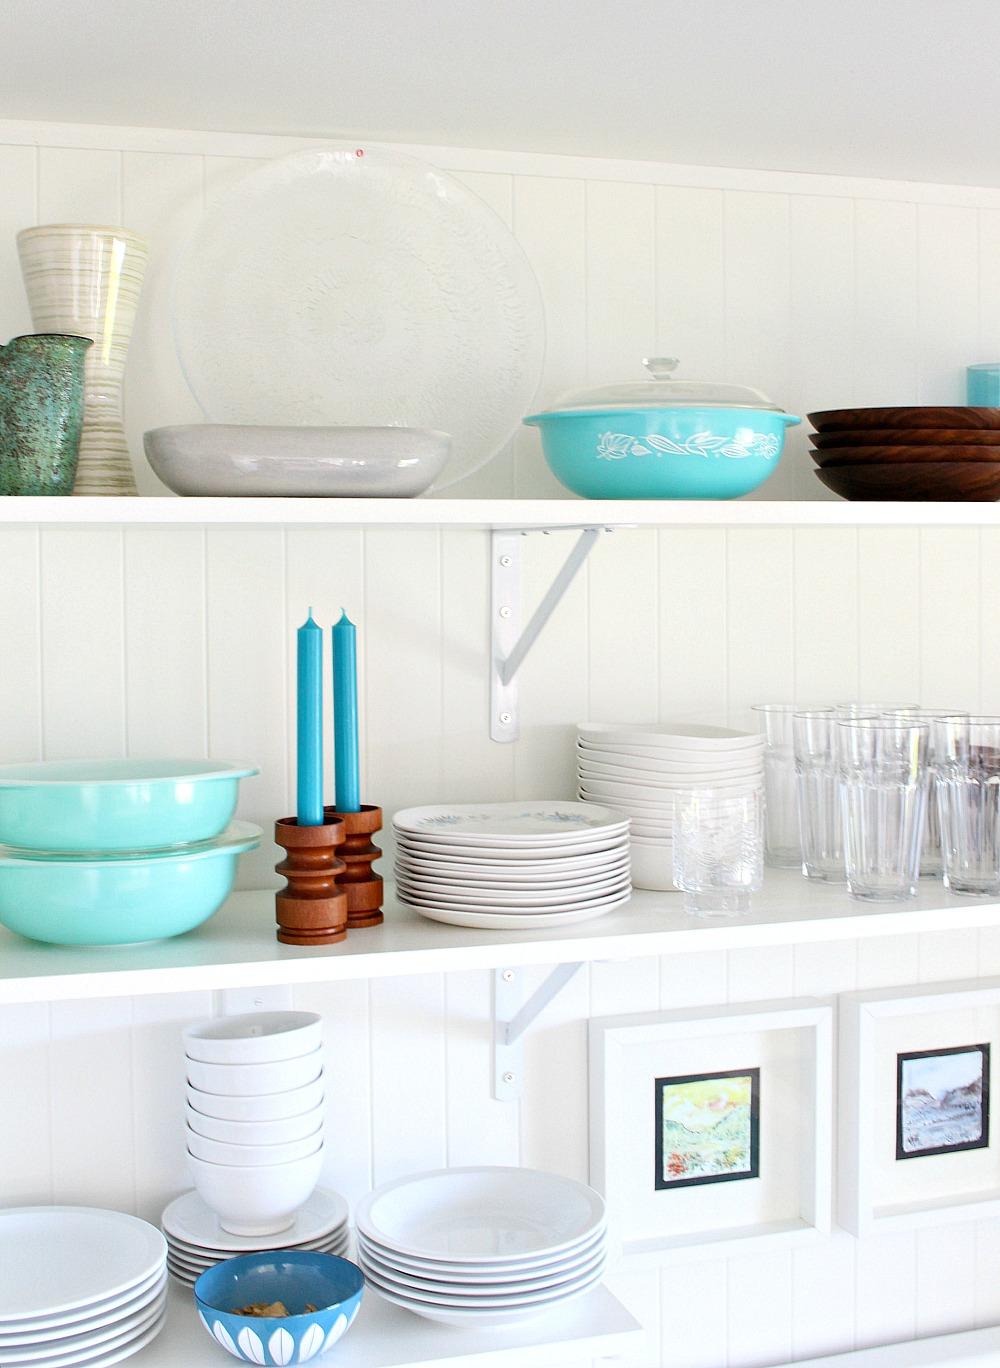 Vintage Styled Kitchen Open Shelving